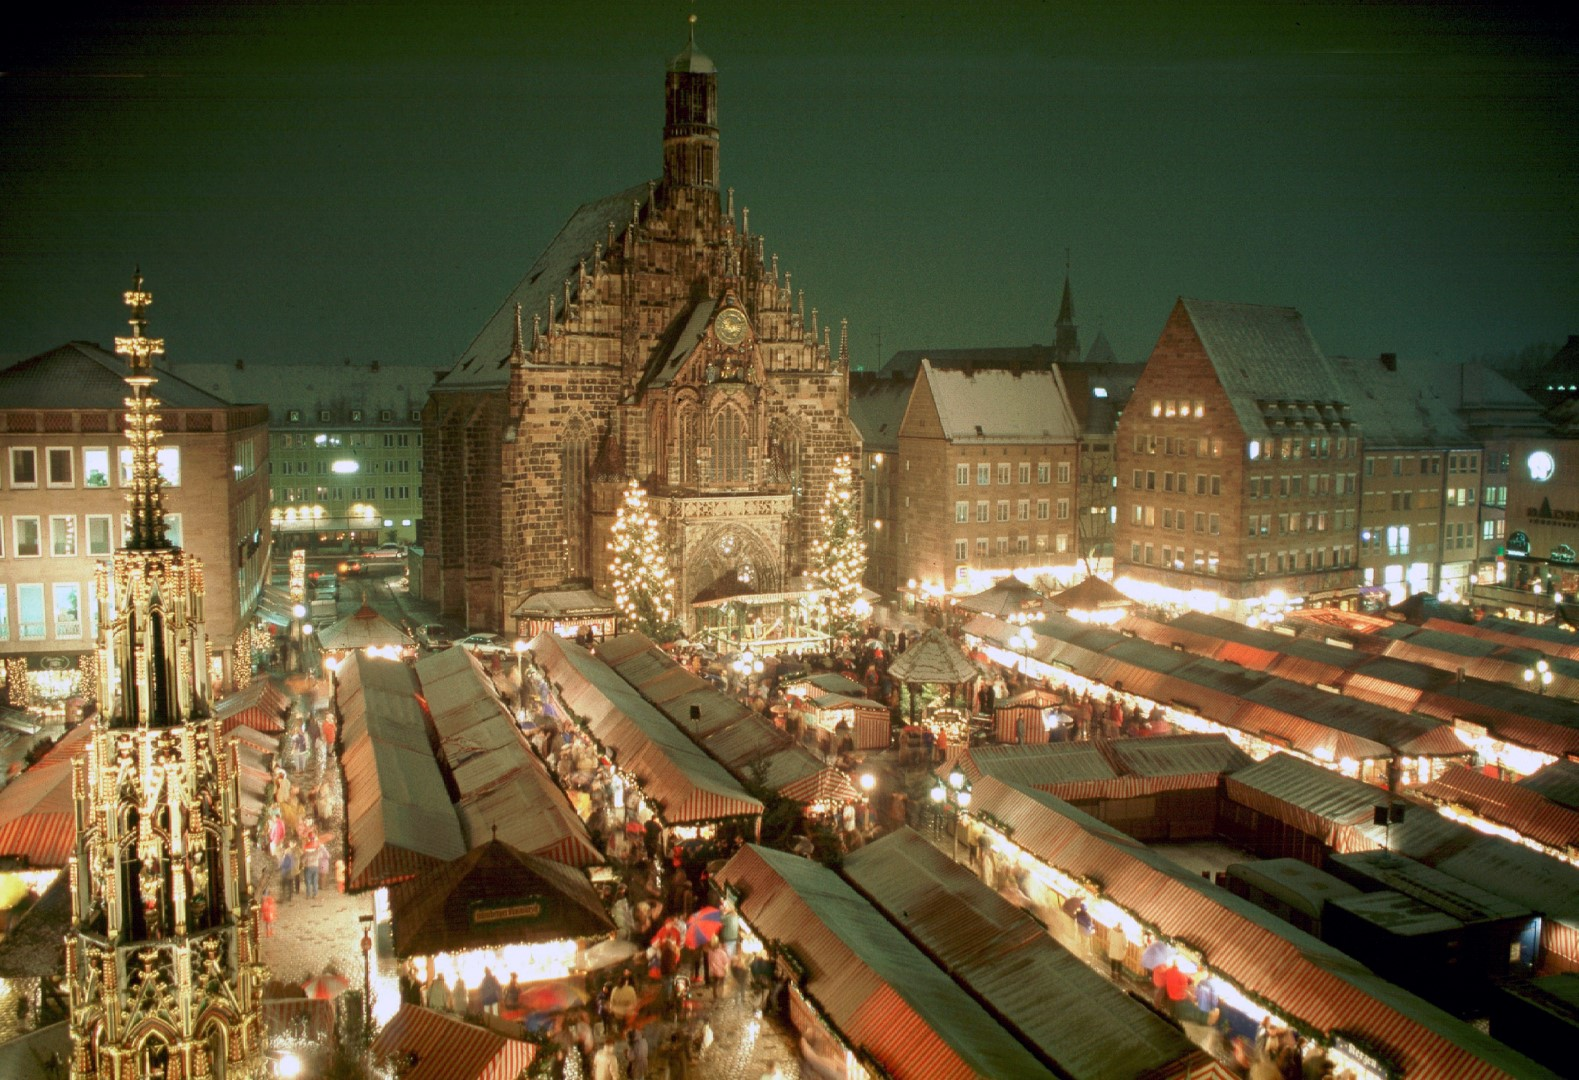 †mercadillos de navidad bersichtsbild vom NŸrnberger Christkindlesmarkt